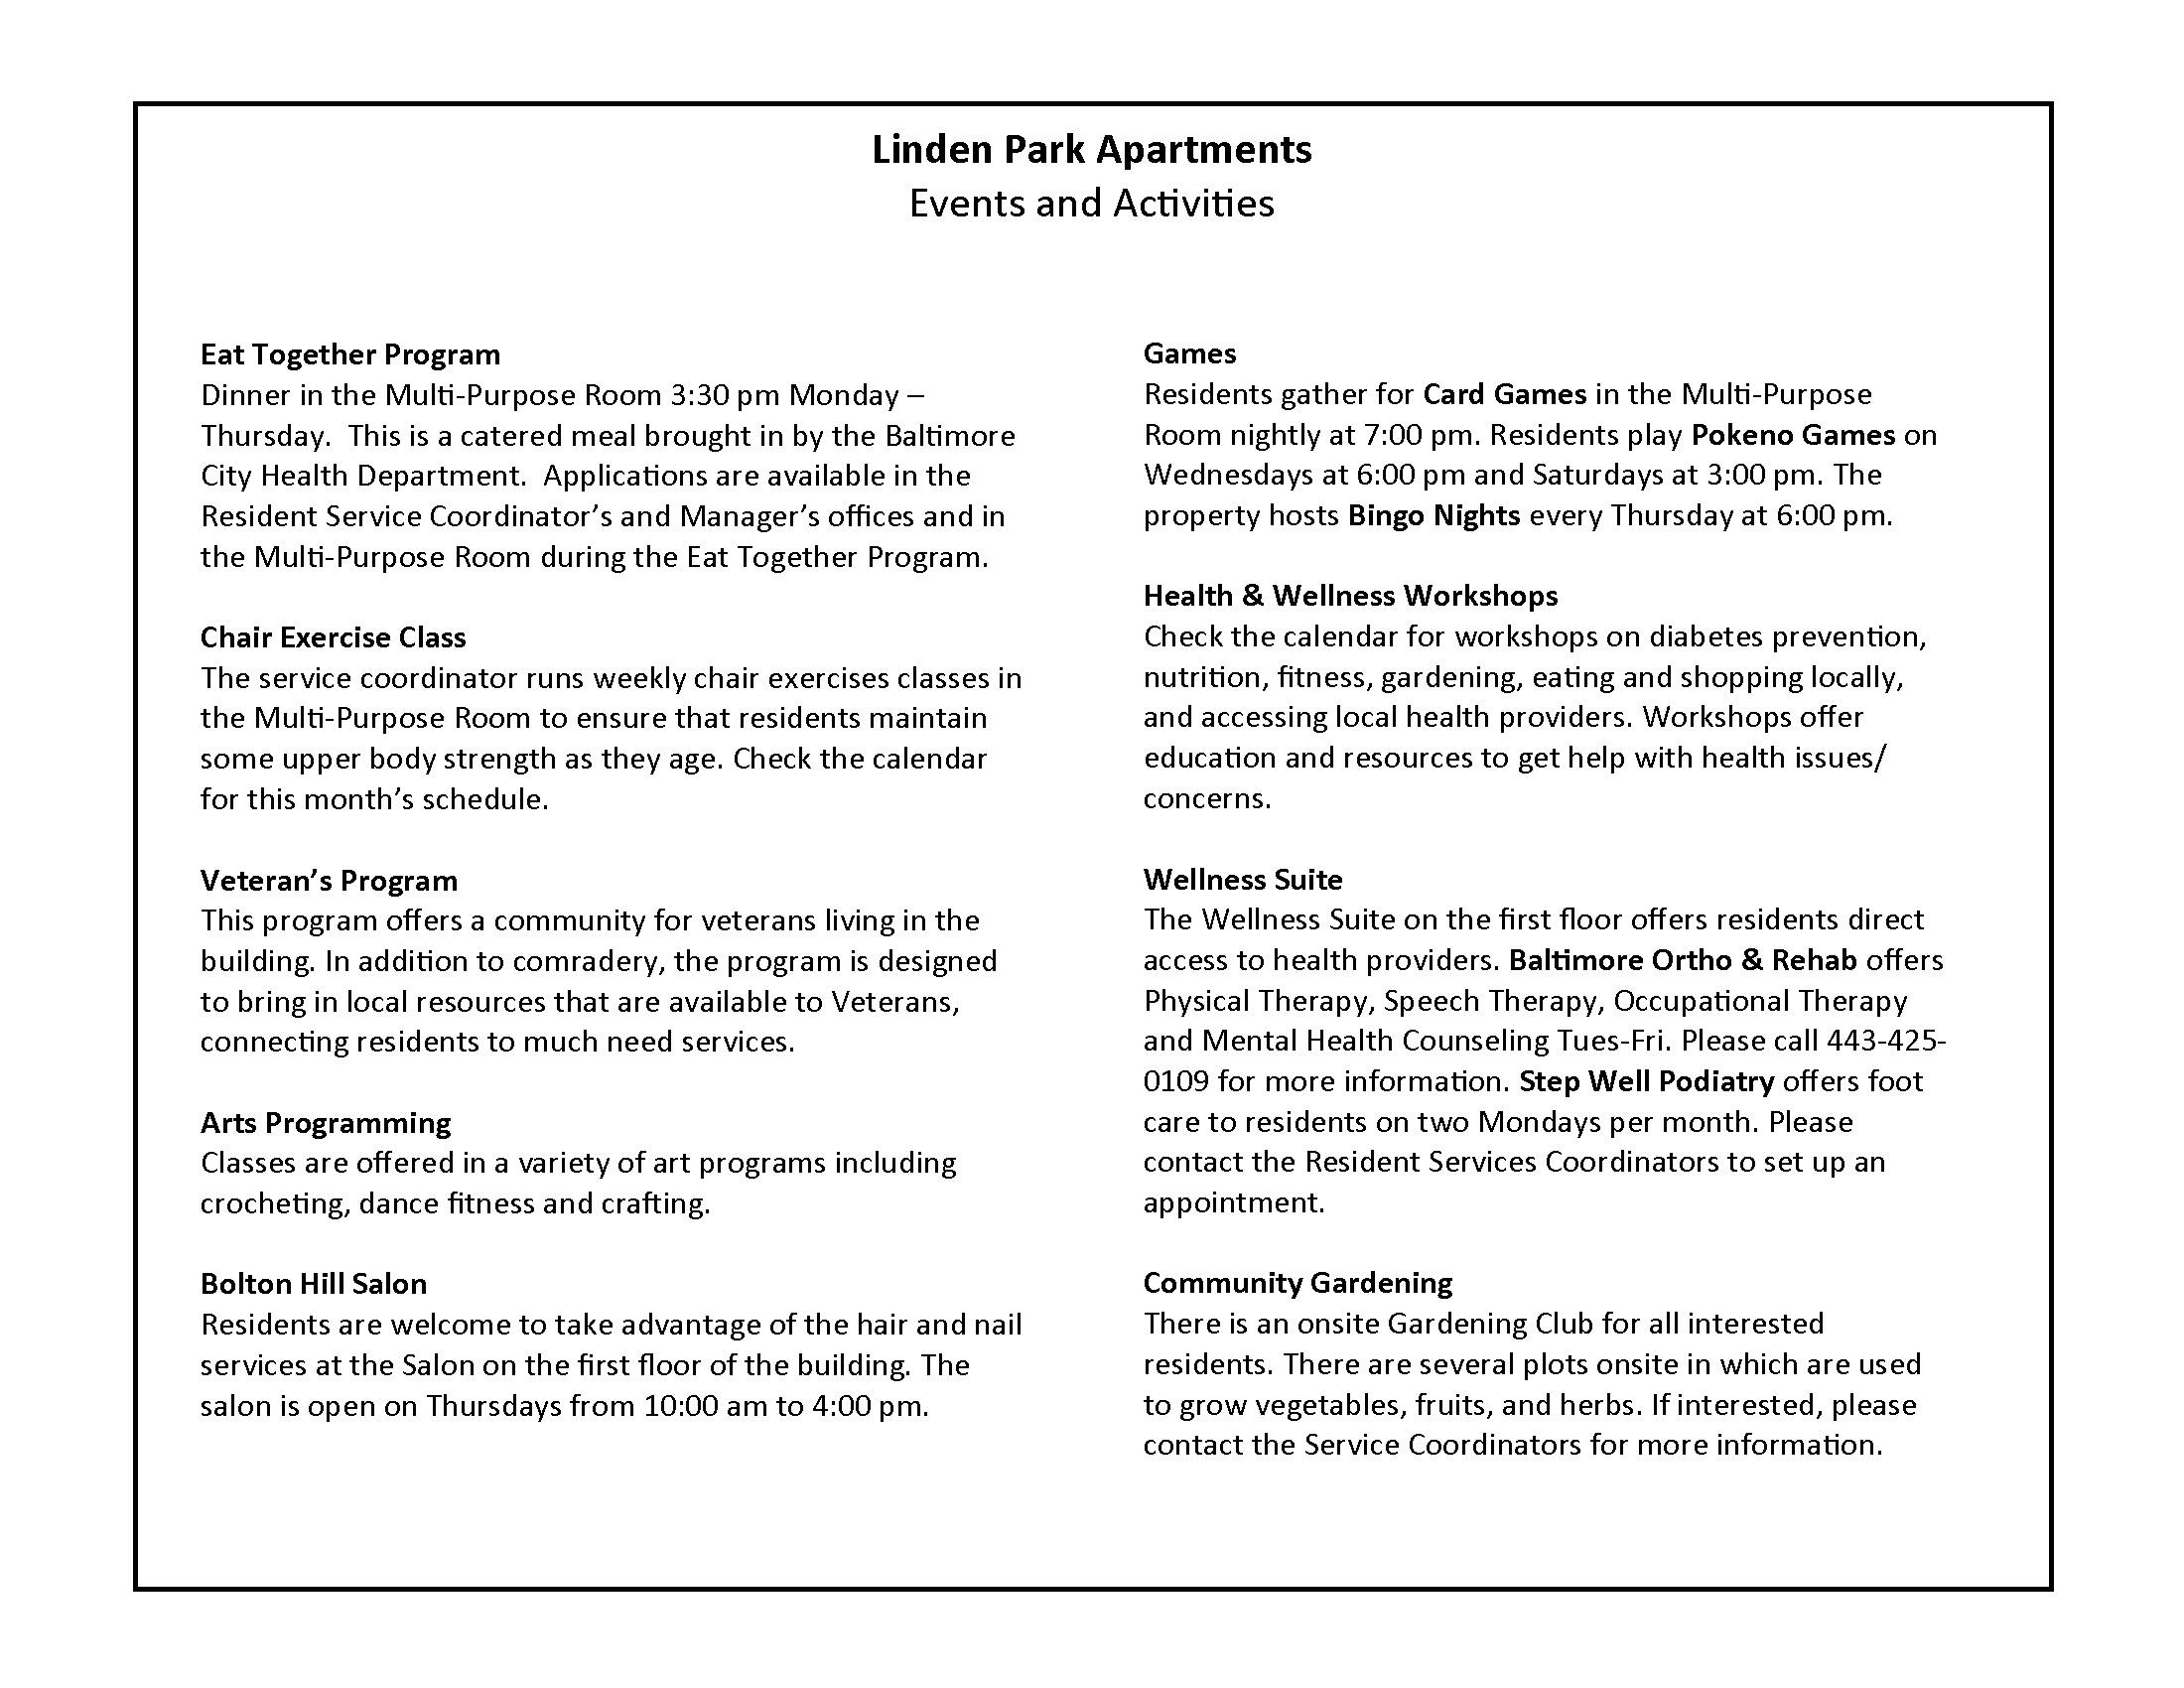 Linden Park Apartments November 2017 Calendar Page 2